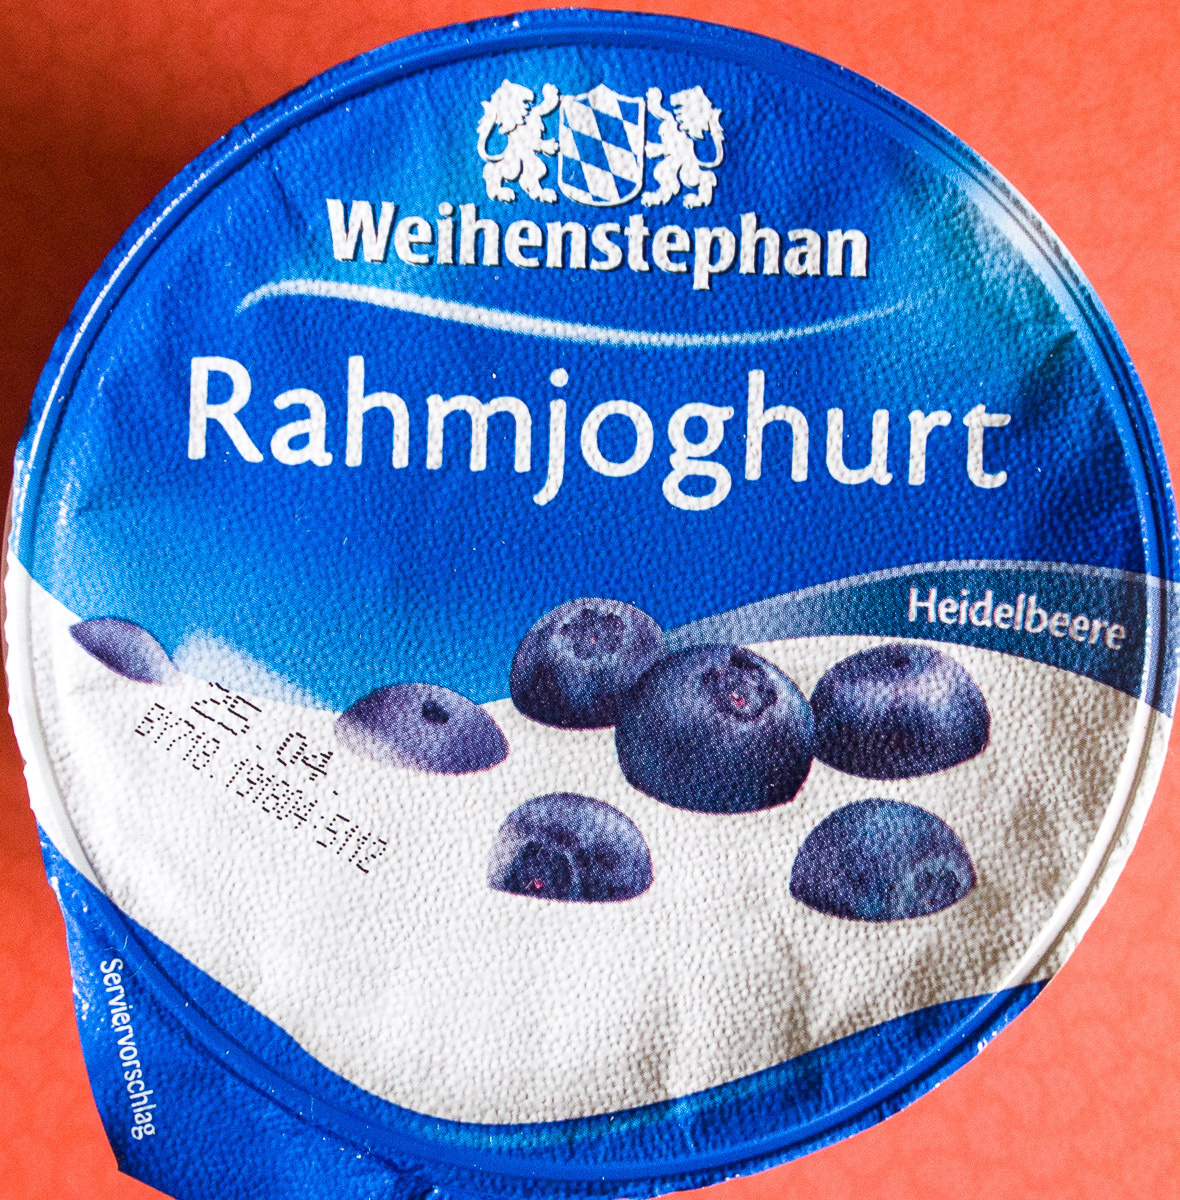 Rahmjoghurt Heidelbeere - Product - de